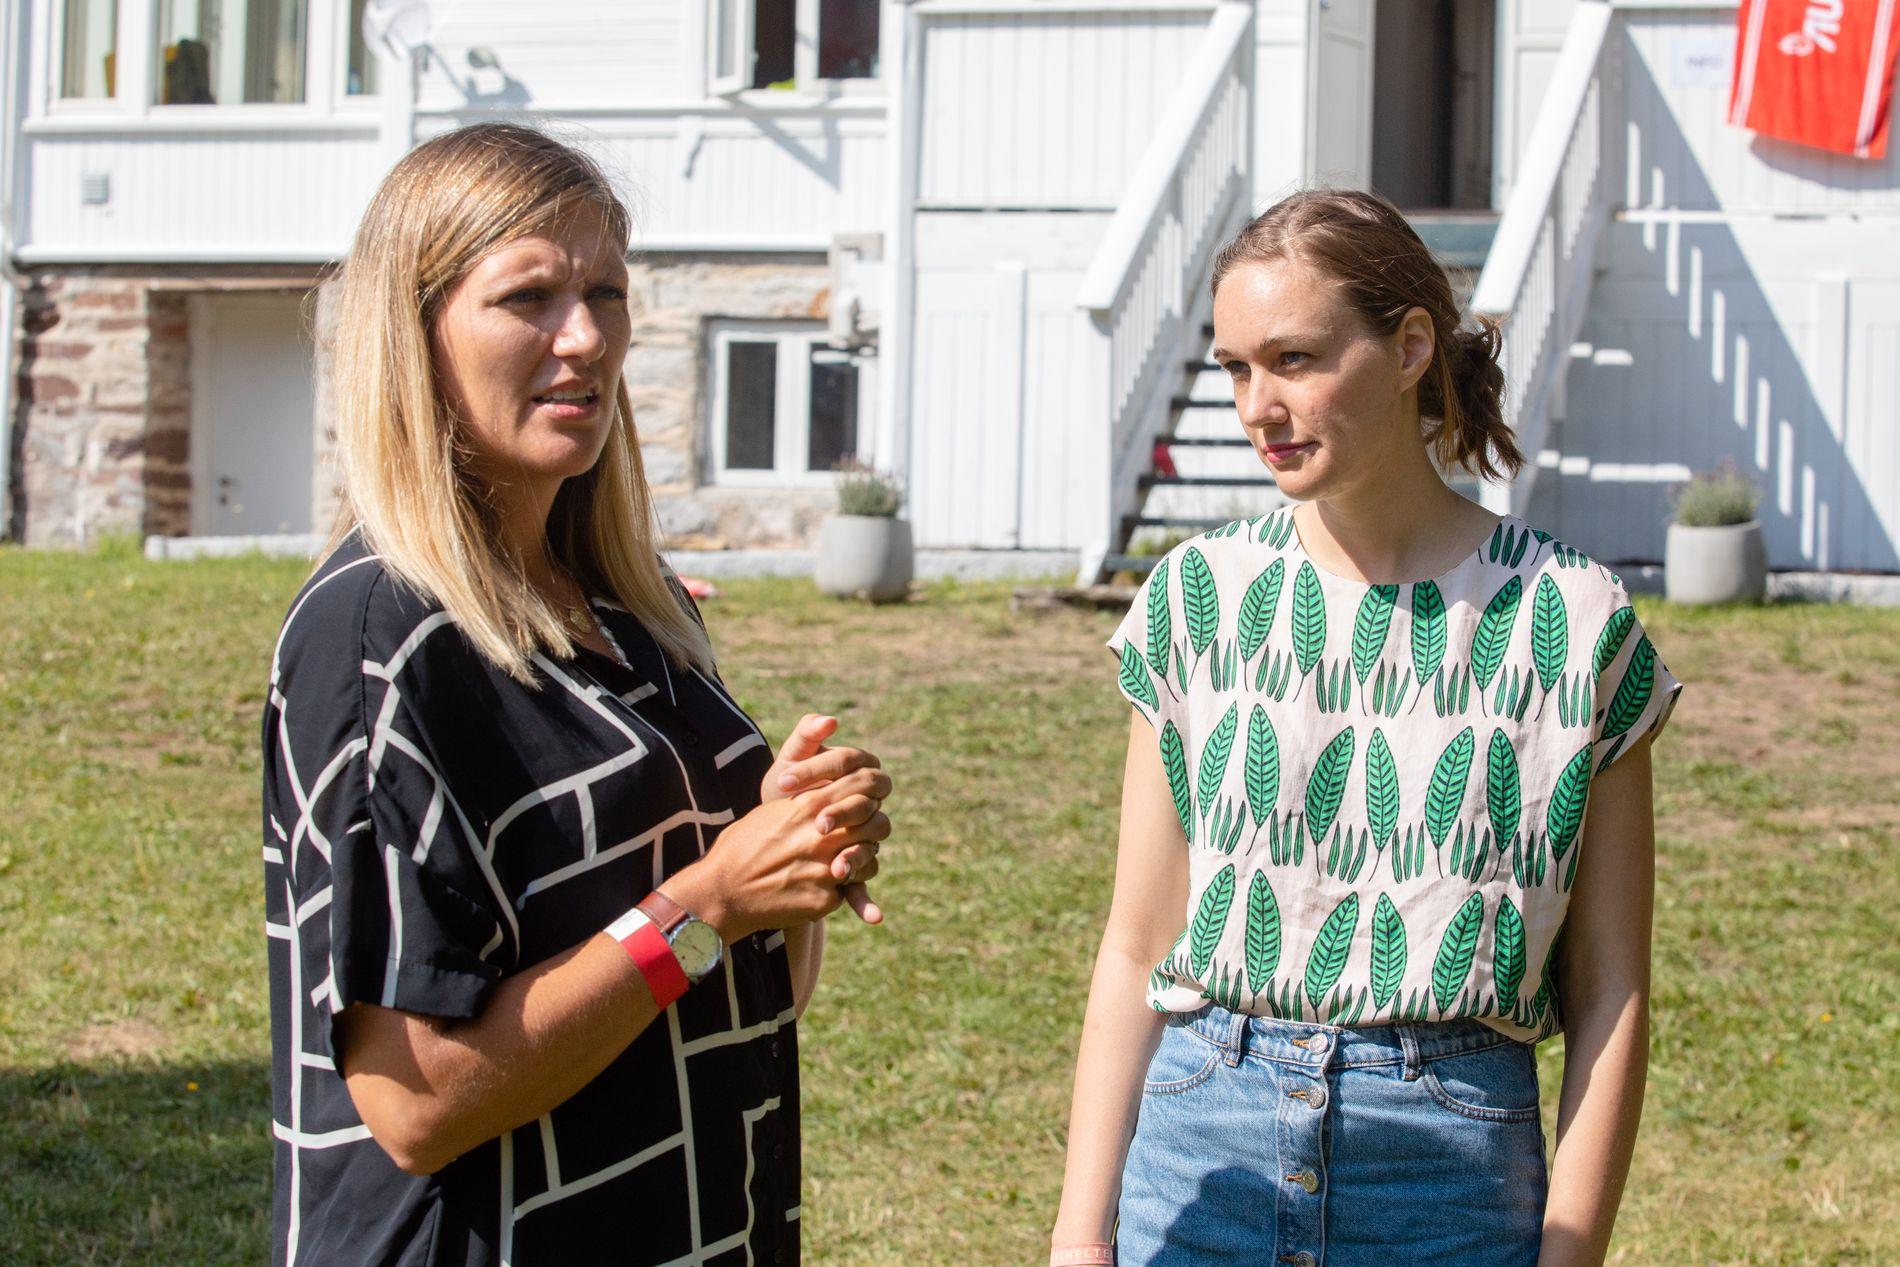 SAMLET: ICANs Beatrice Fihn og AUF-leder Ina Libak mener tiden er inne for at Norge burde signere et atomvåpen-forbud.